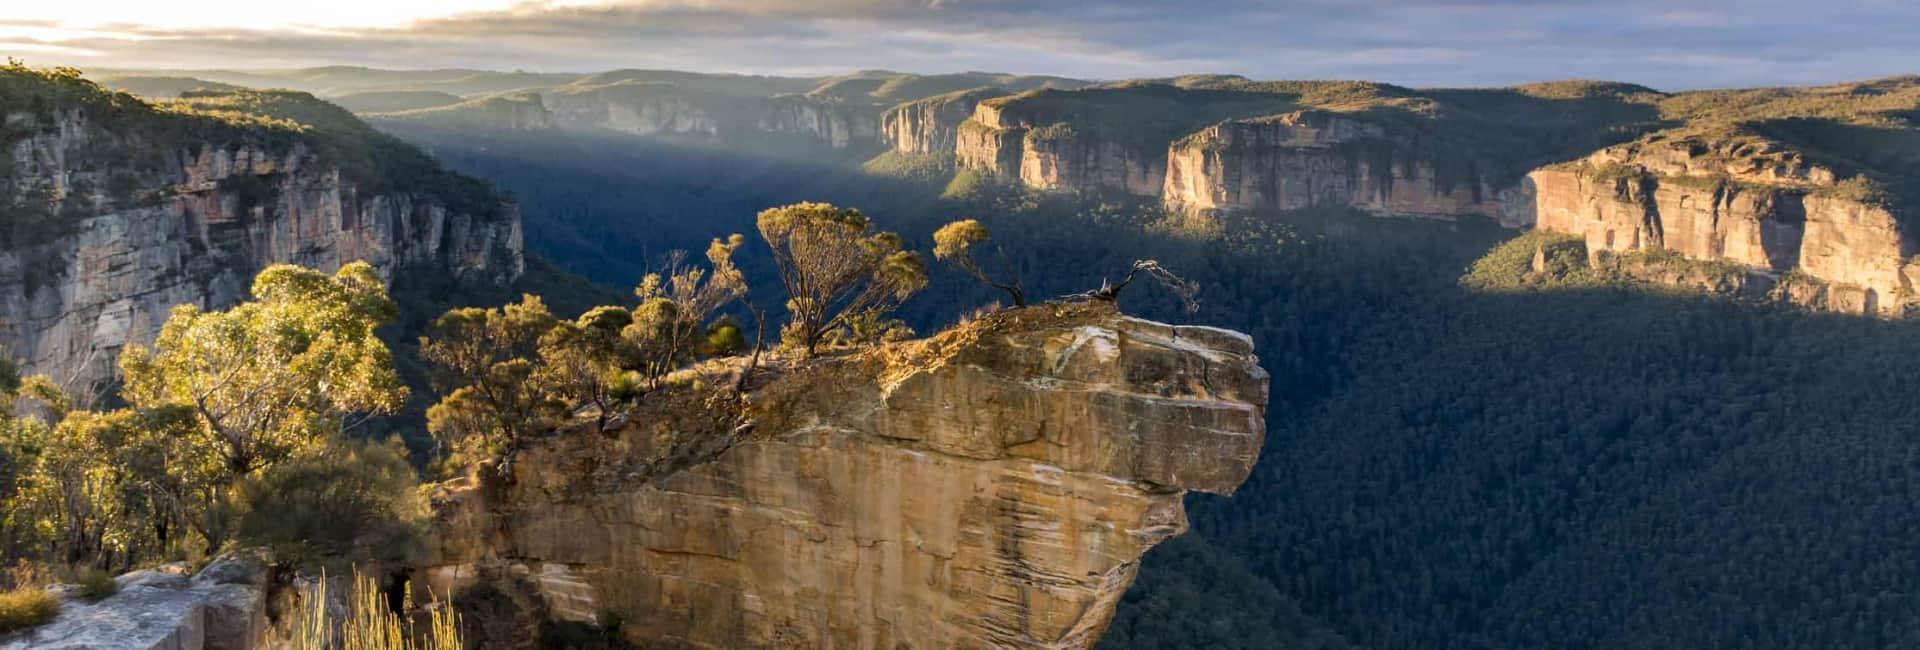 Blue Mountain i Australien